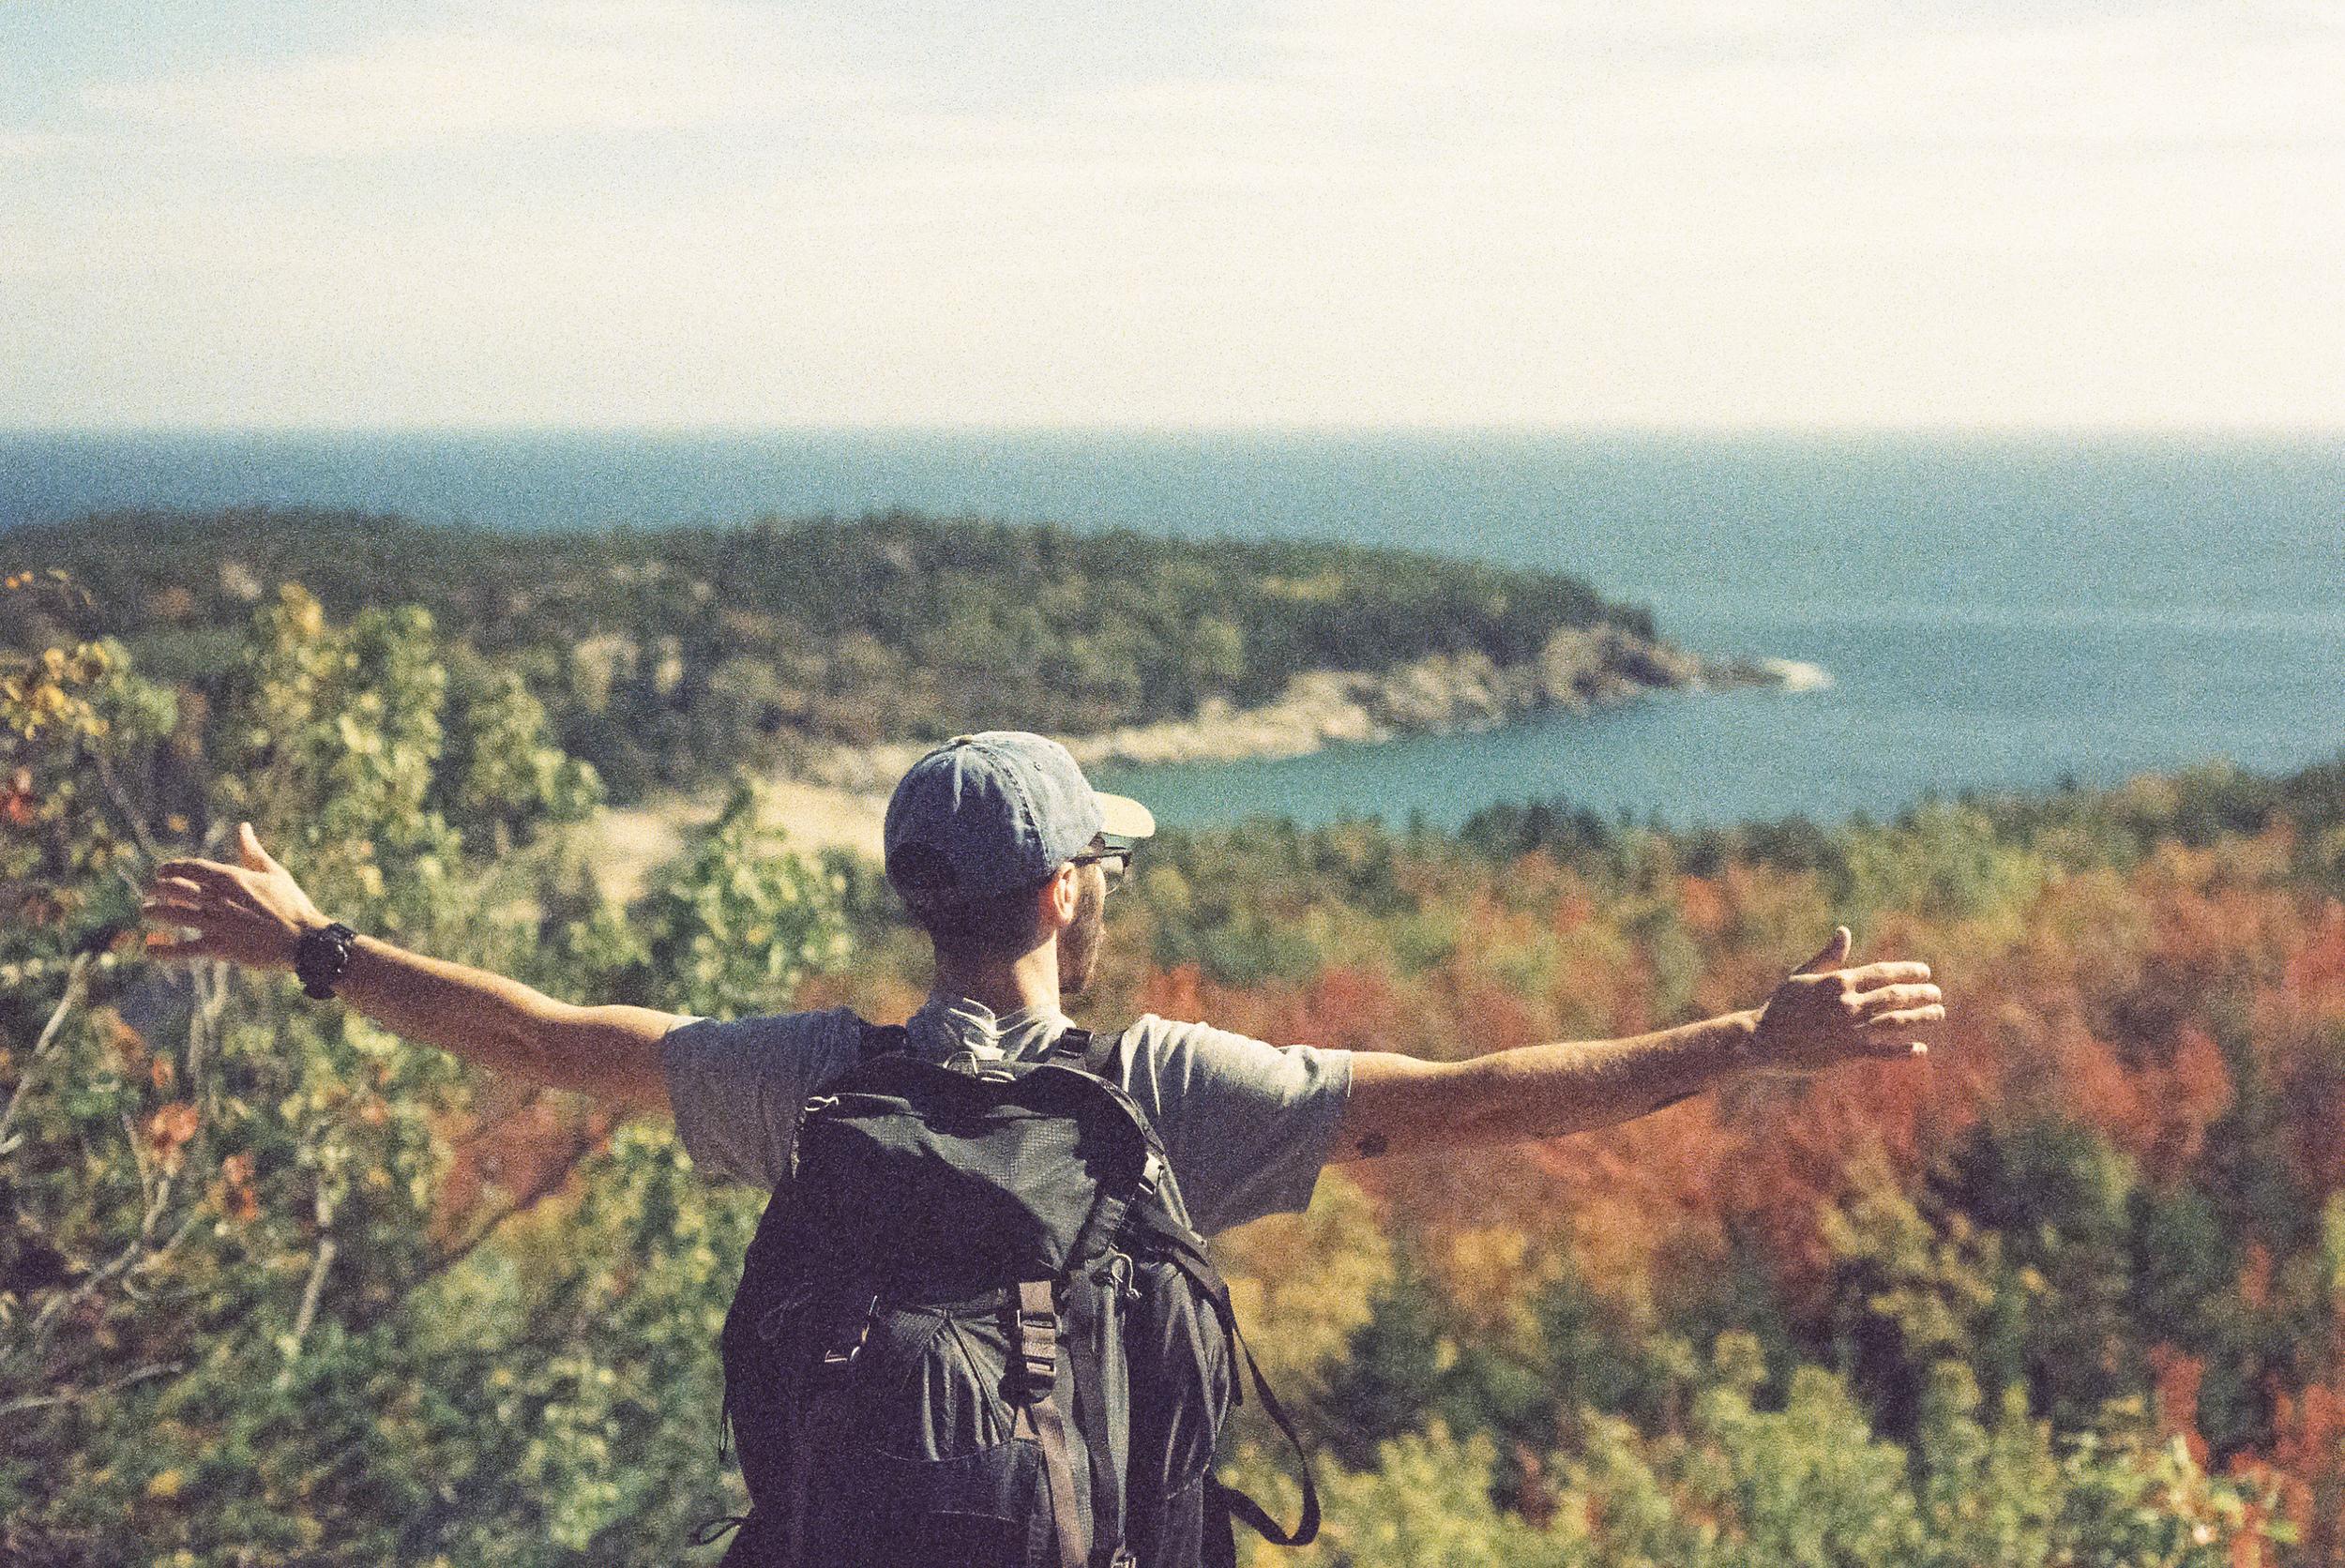 Stephen looking over Acadia. [Nikon F3 / 50 / Kodak Elite Chrome (expired)]